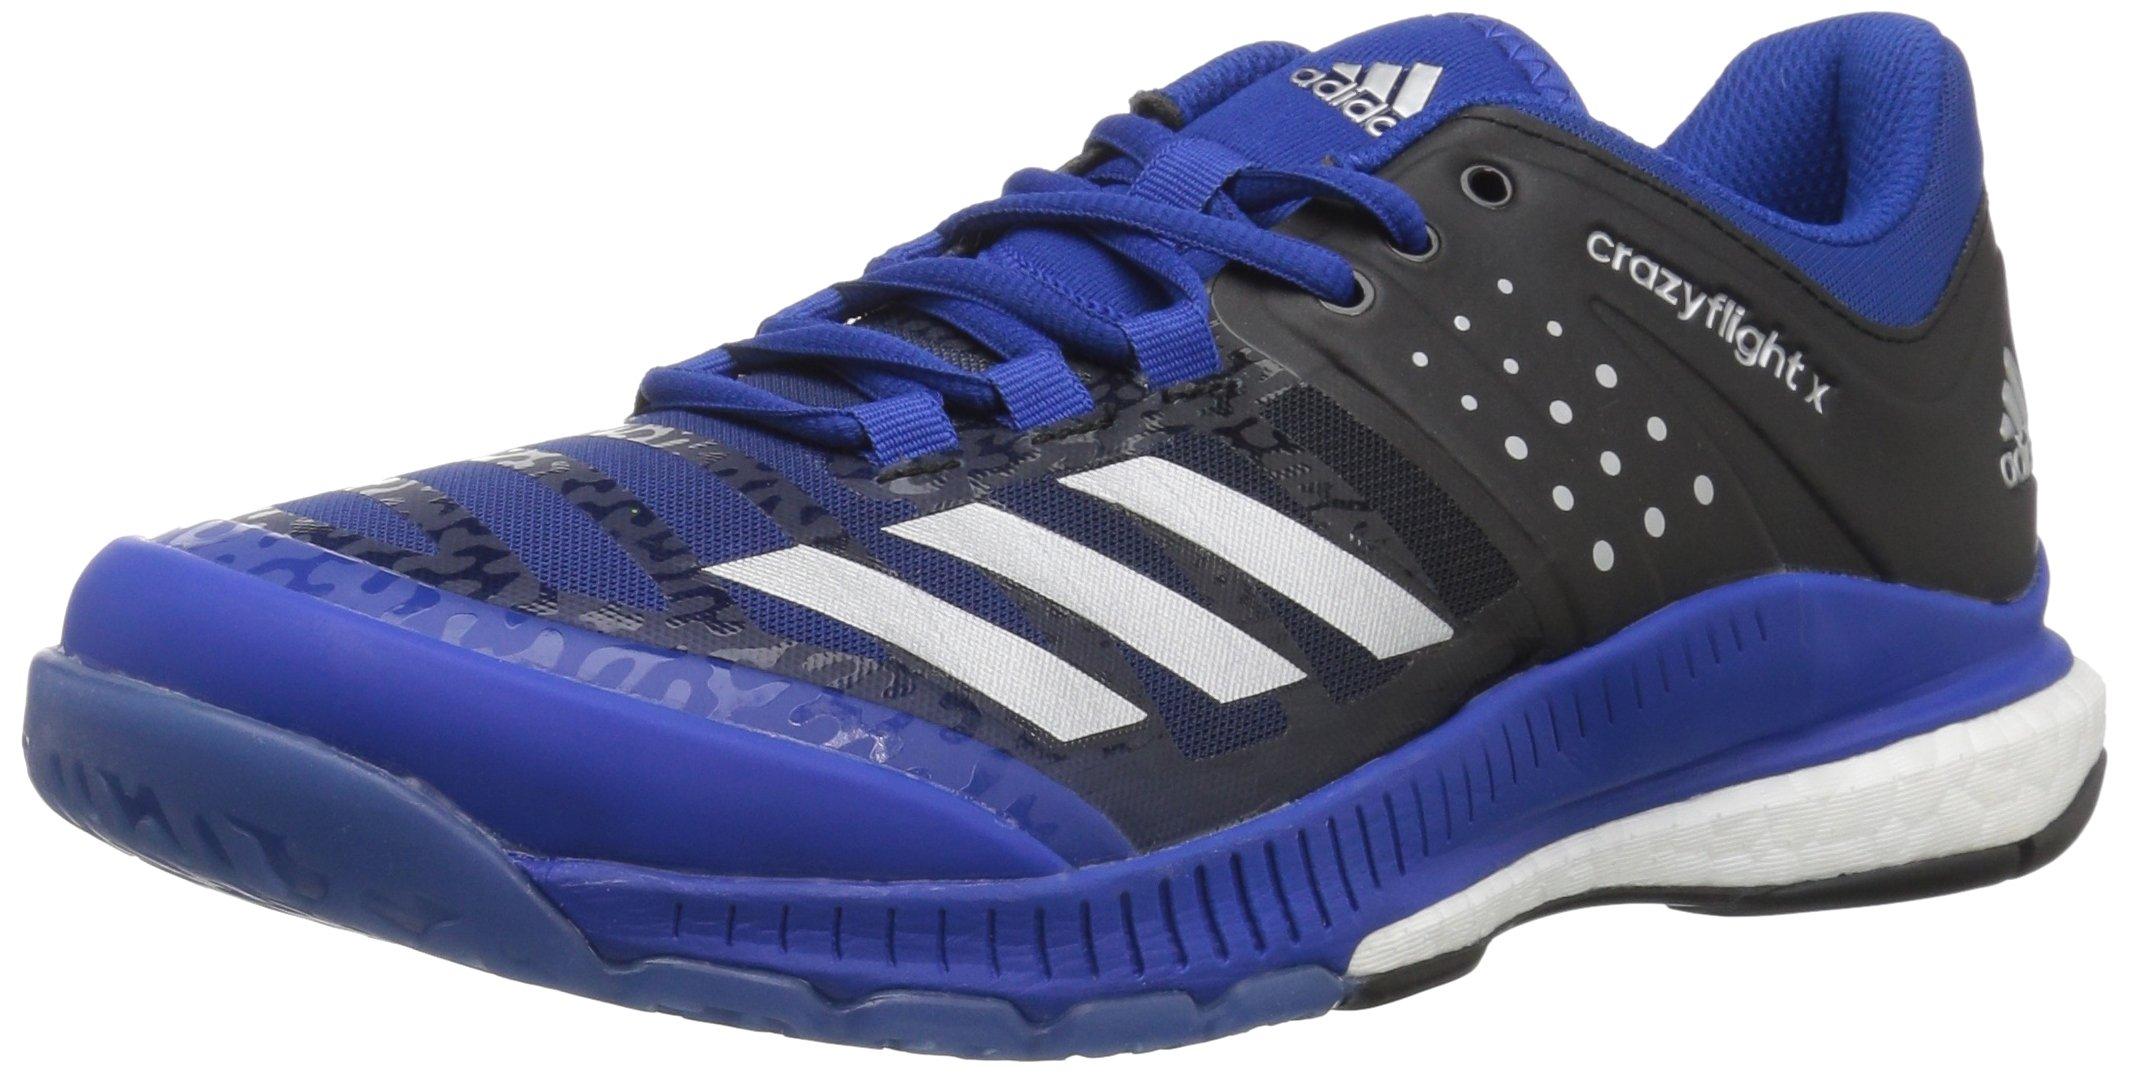 adidas Women's Crazyflight X Volleyball Shoe